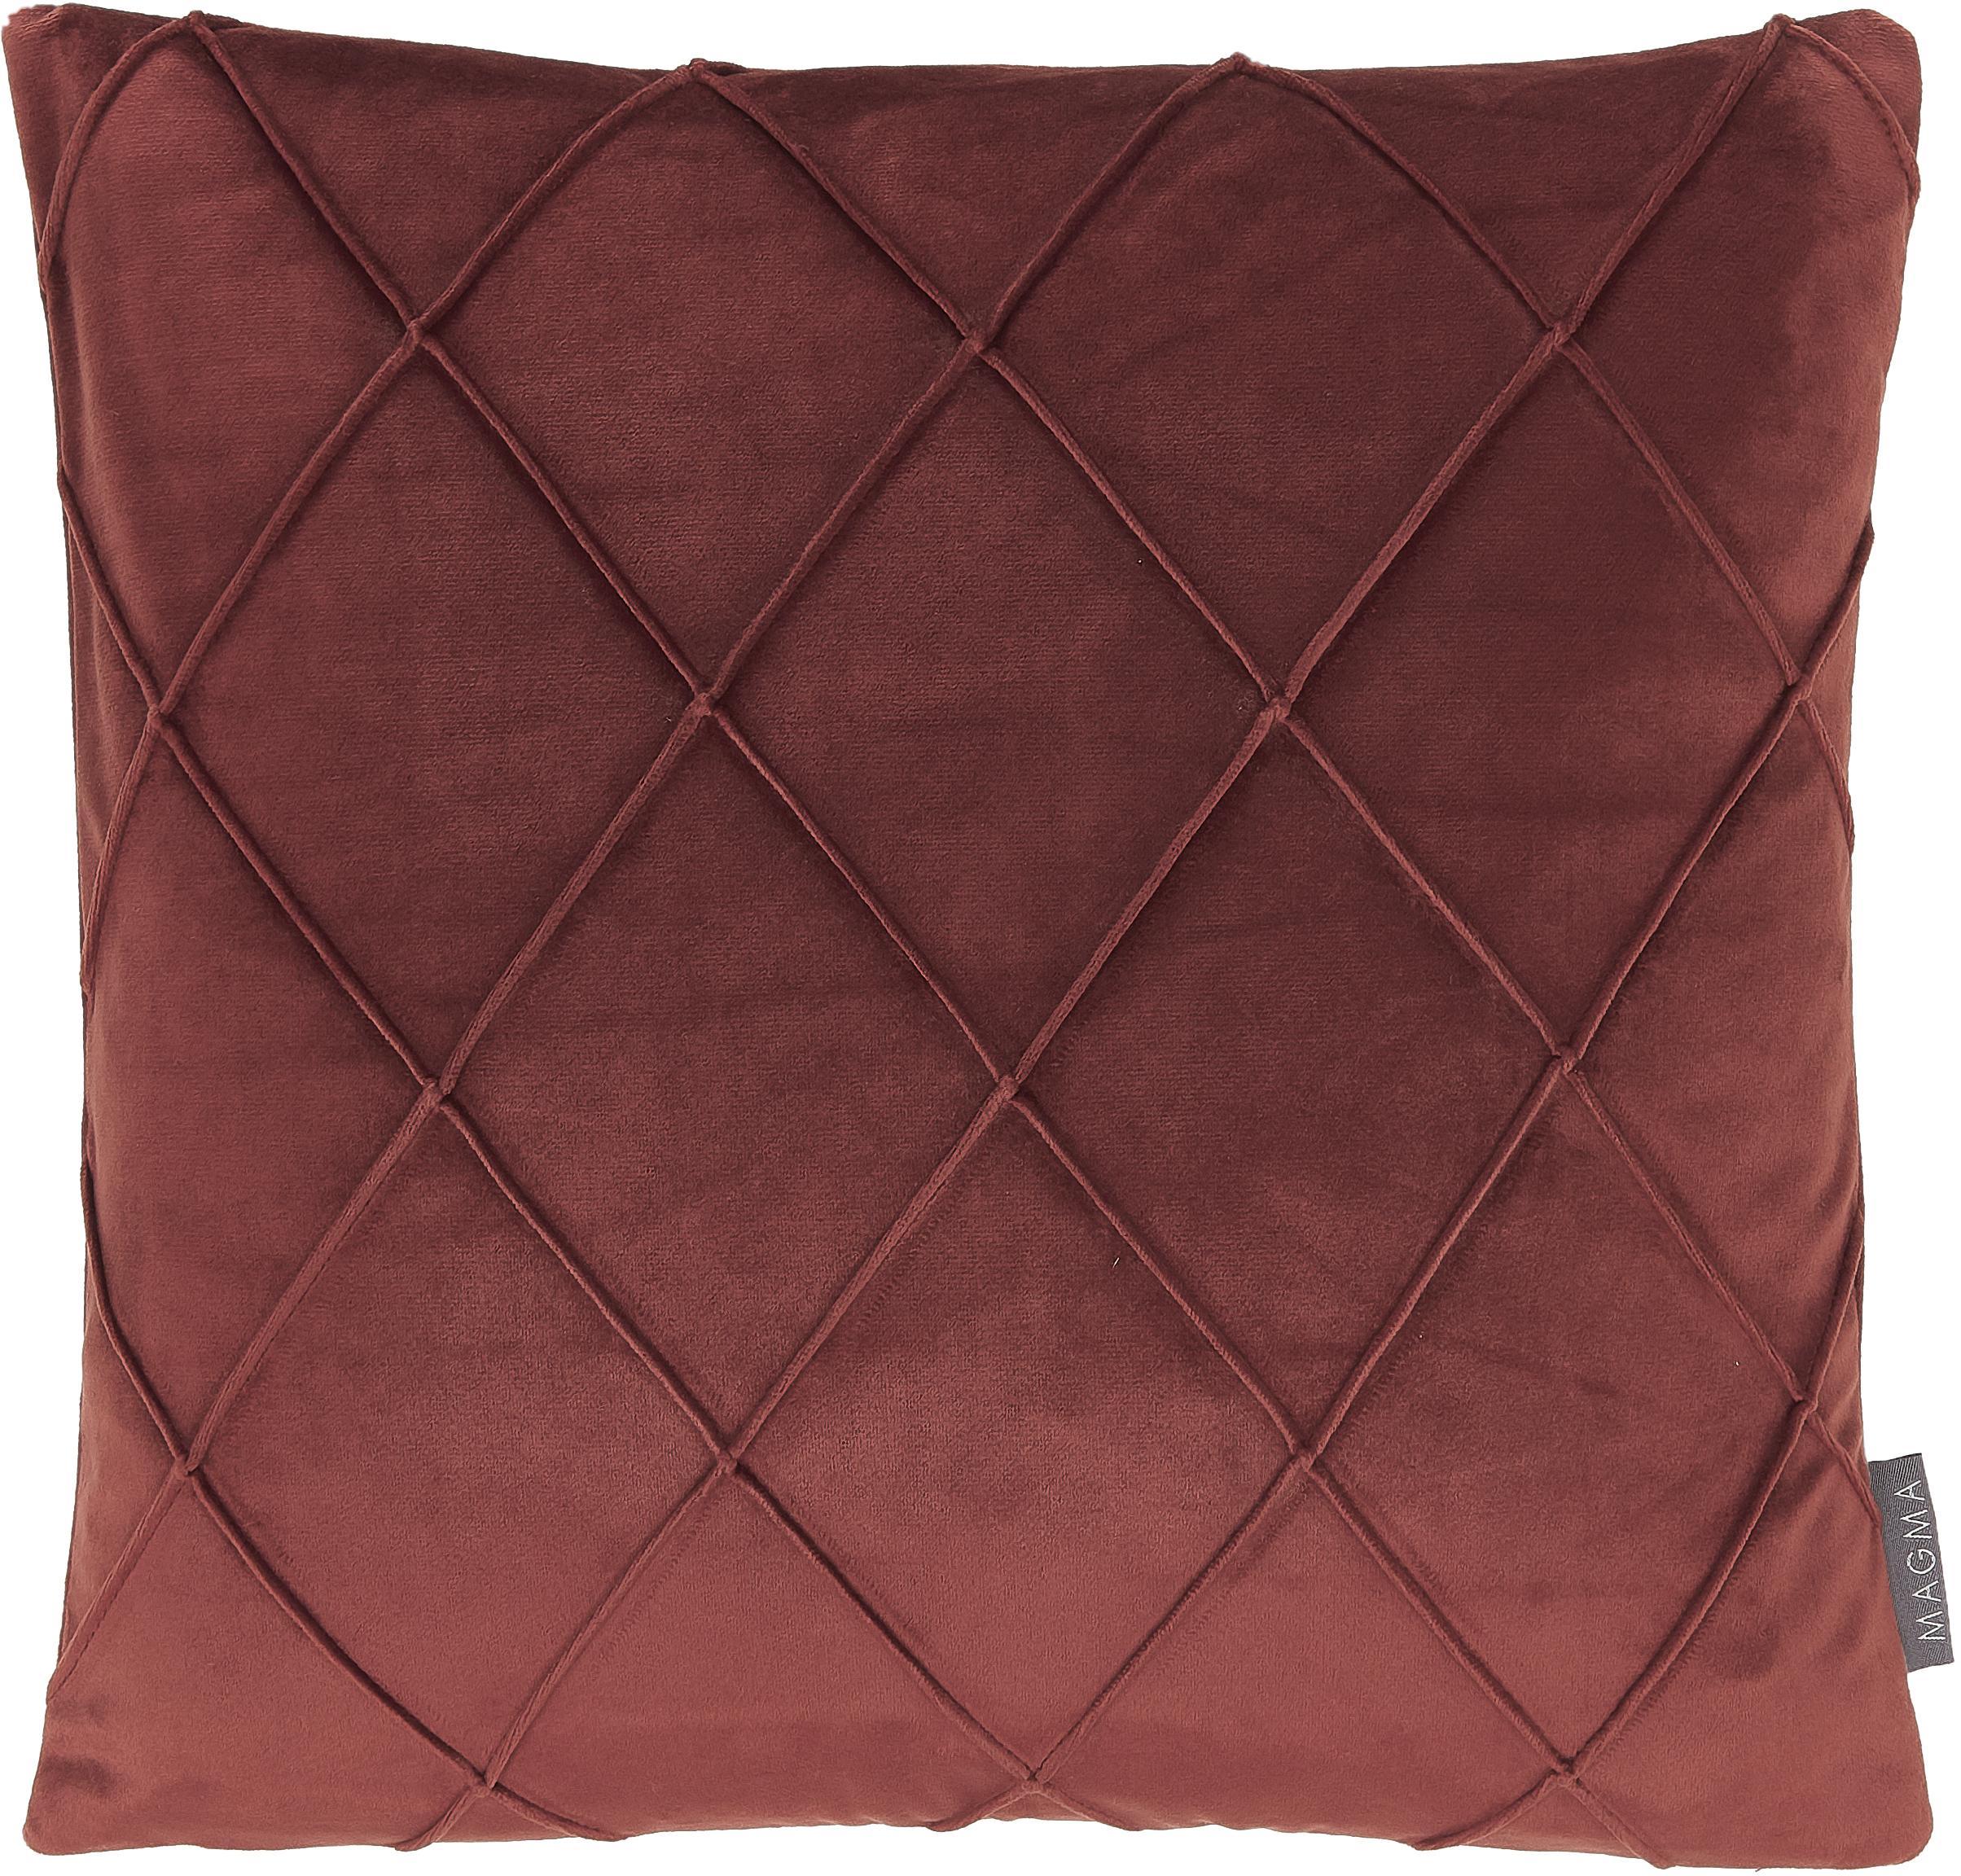 Samt-Kissenhülle Nobless mit erhabenem Rautenmuster, 100% Polyestersamt, Terrakottarot, 40 x 40 cm